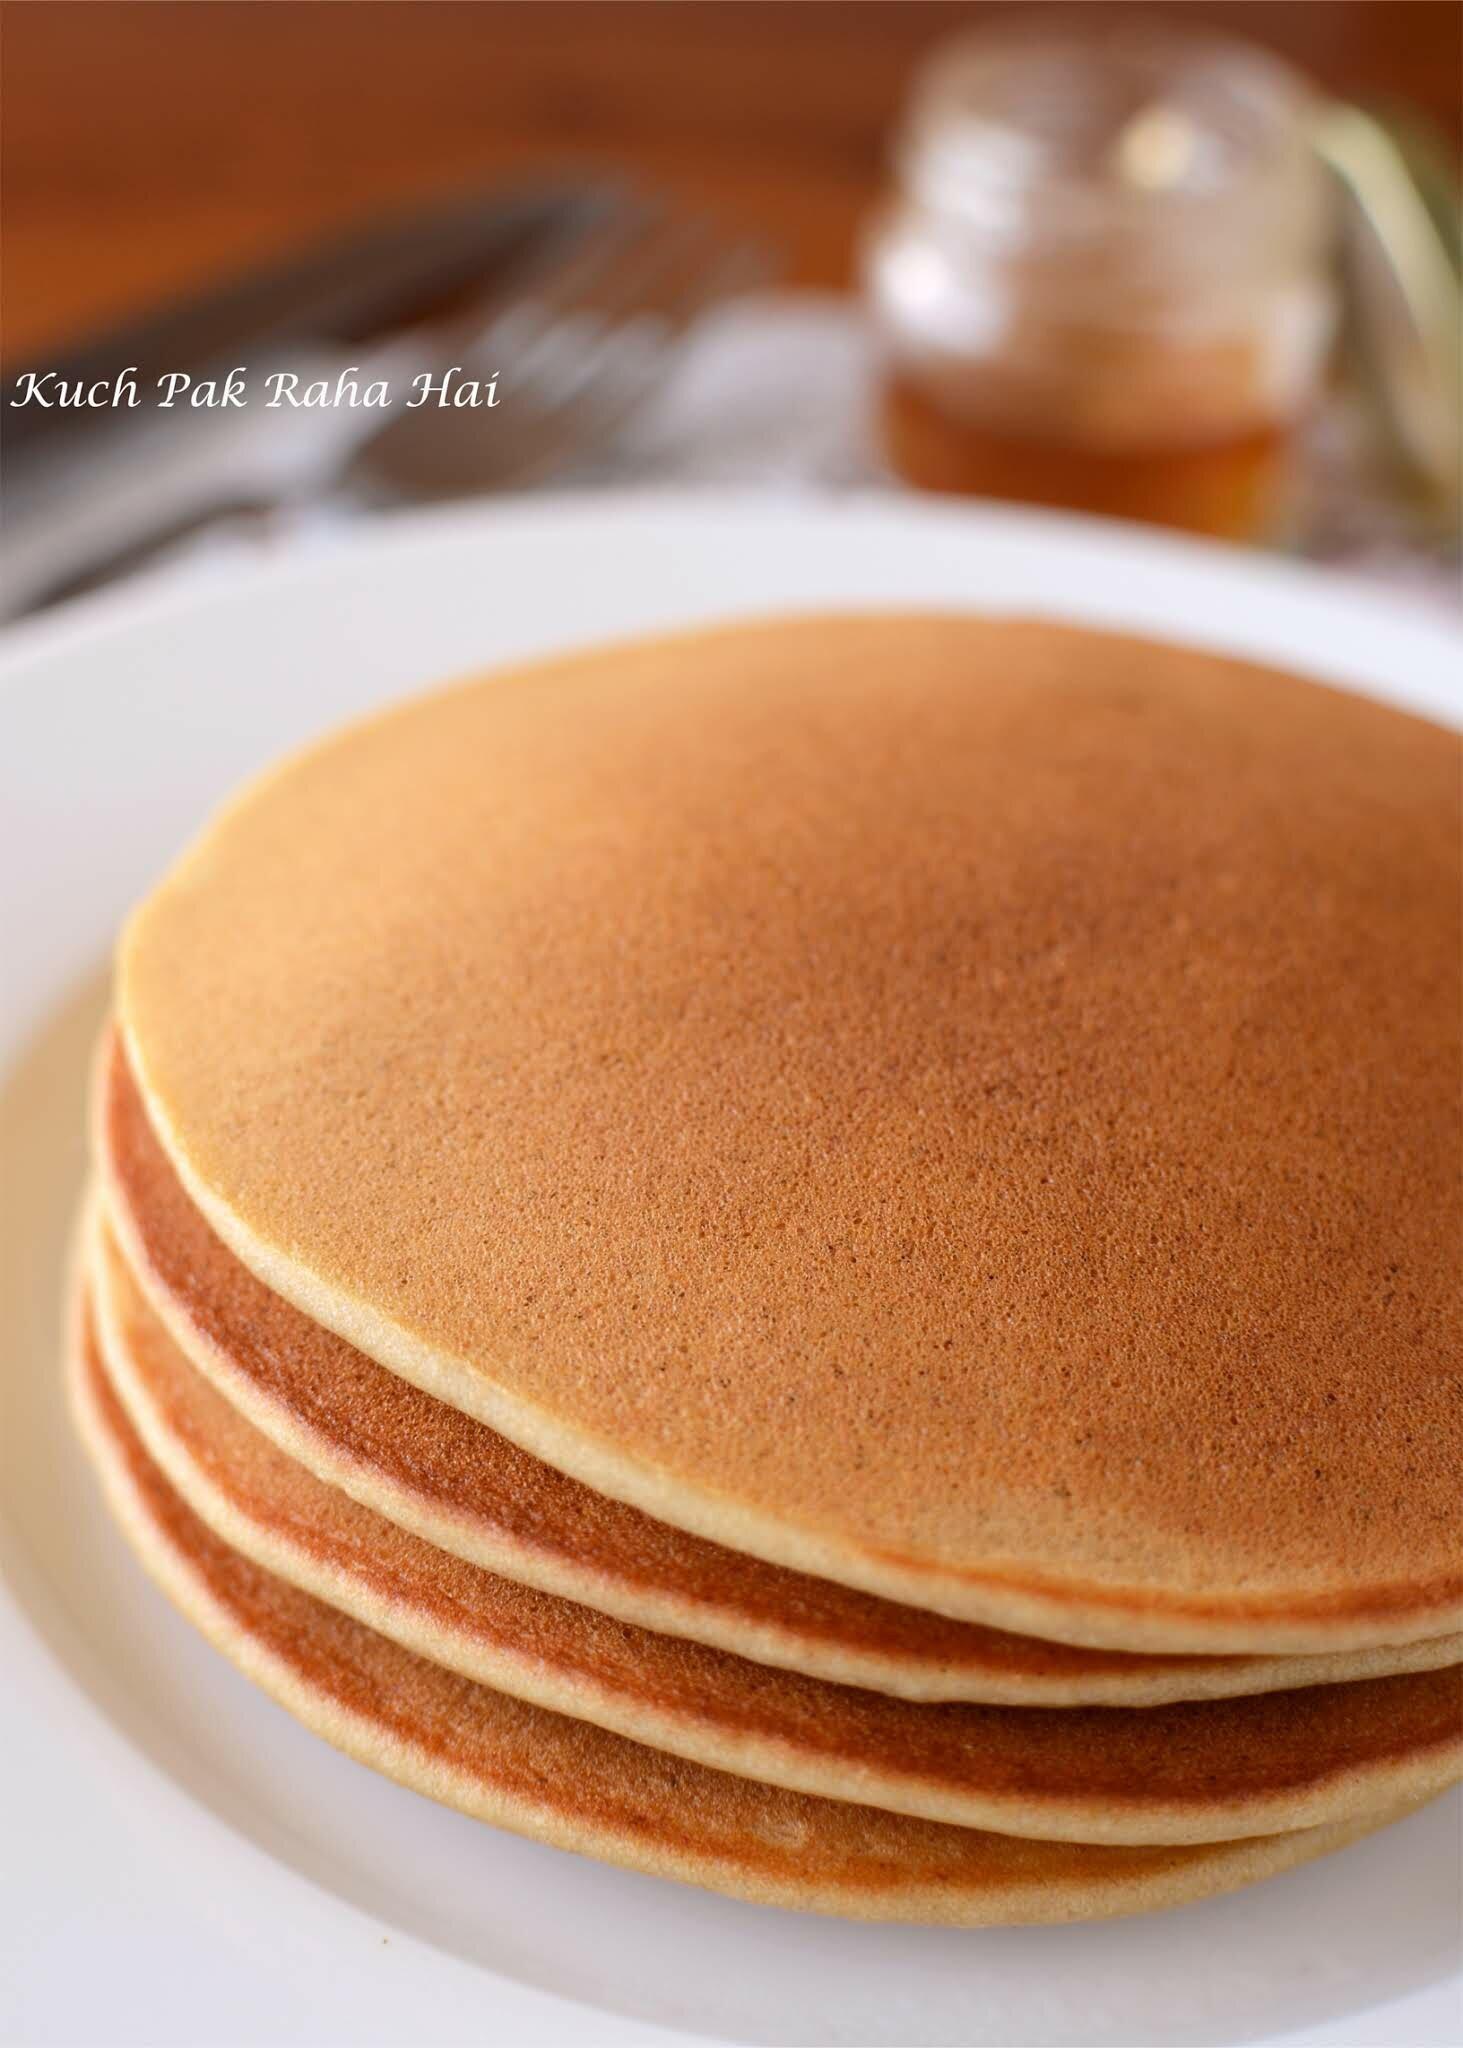 Eggless Banana Pancakes recipe made using whole wheat flour